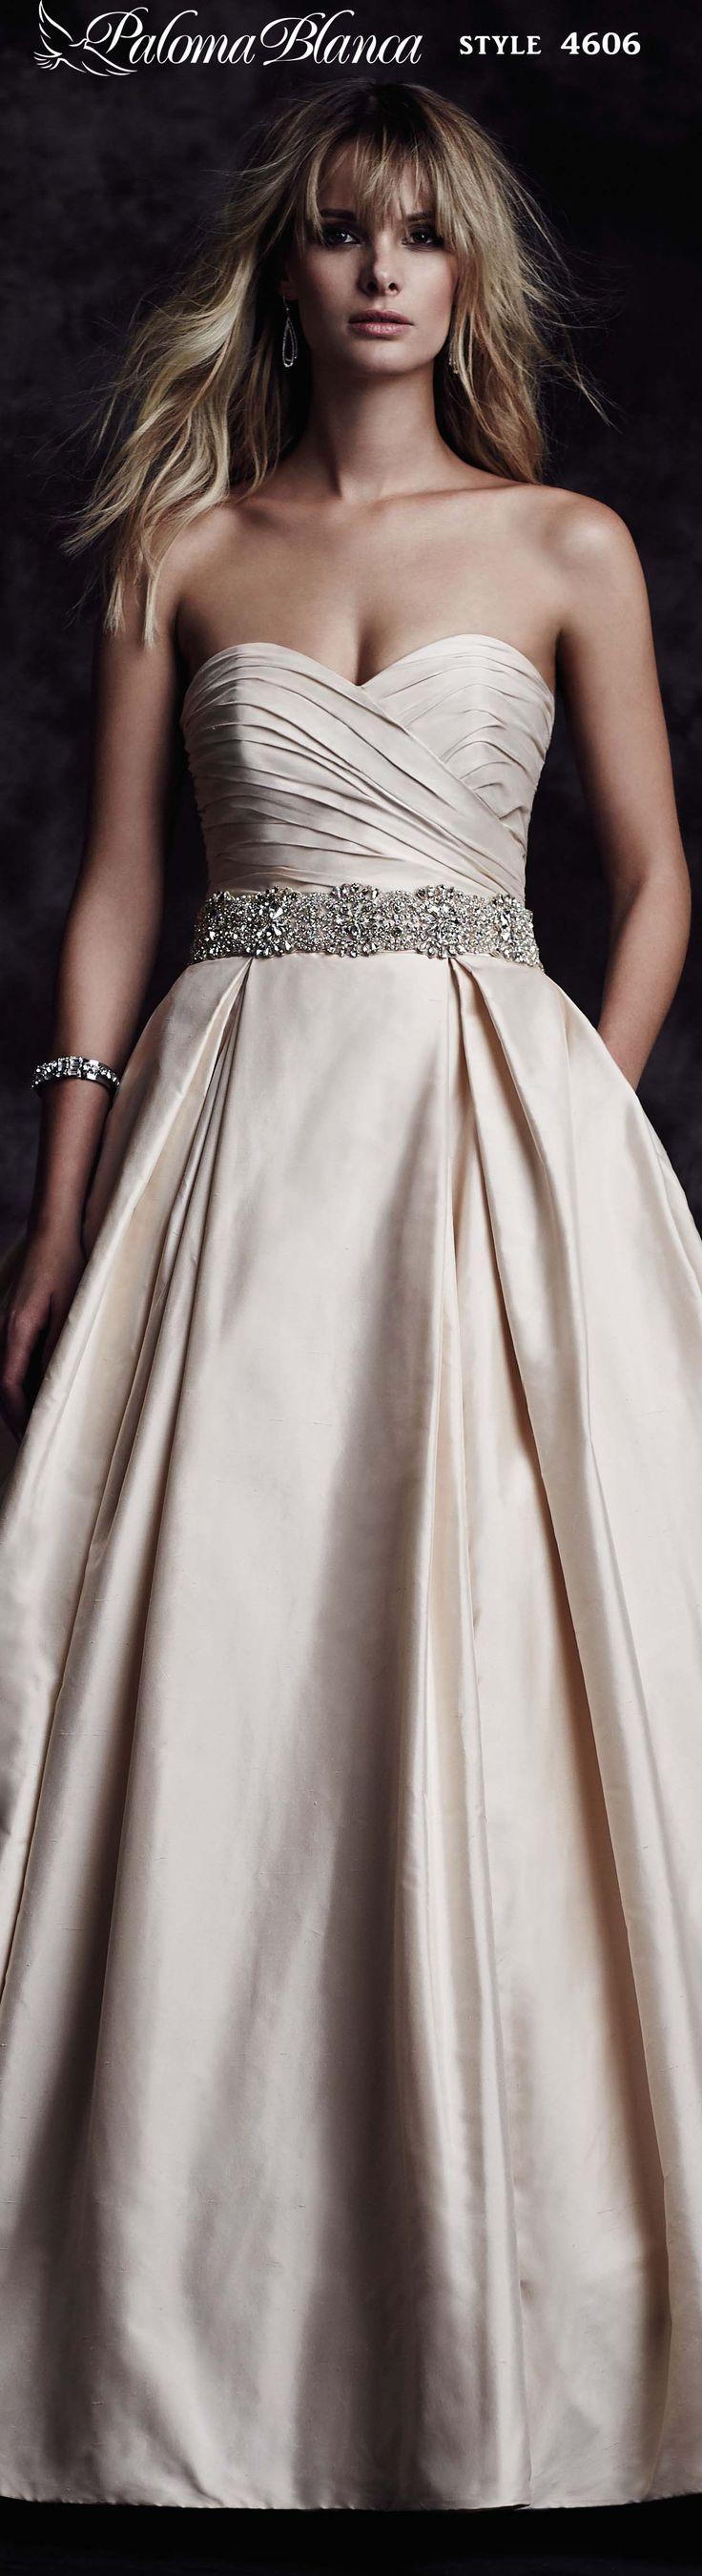 Style 4606- Paloma Blanca Fall 2015 #ballgown #weddingdress #bride